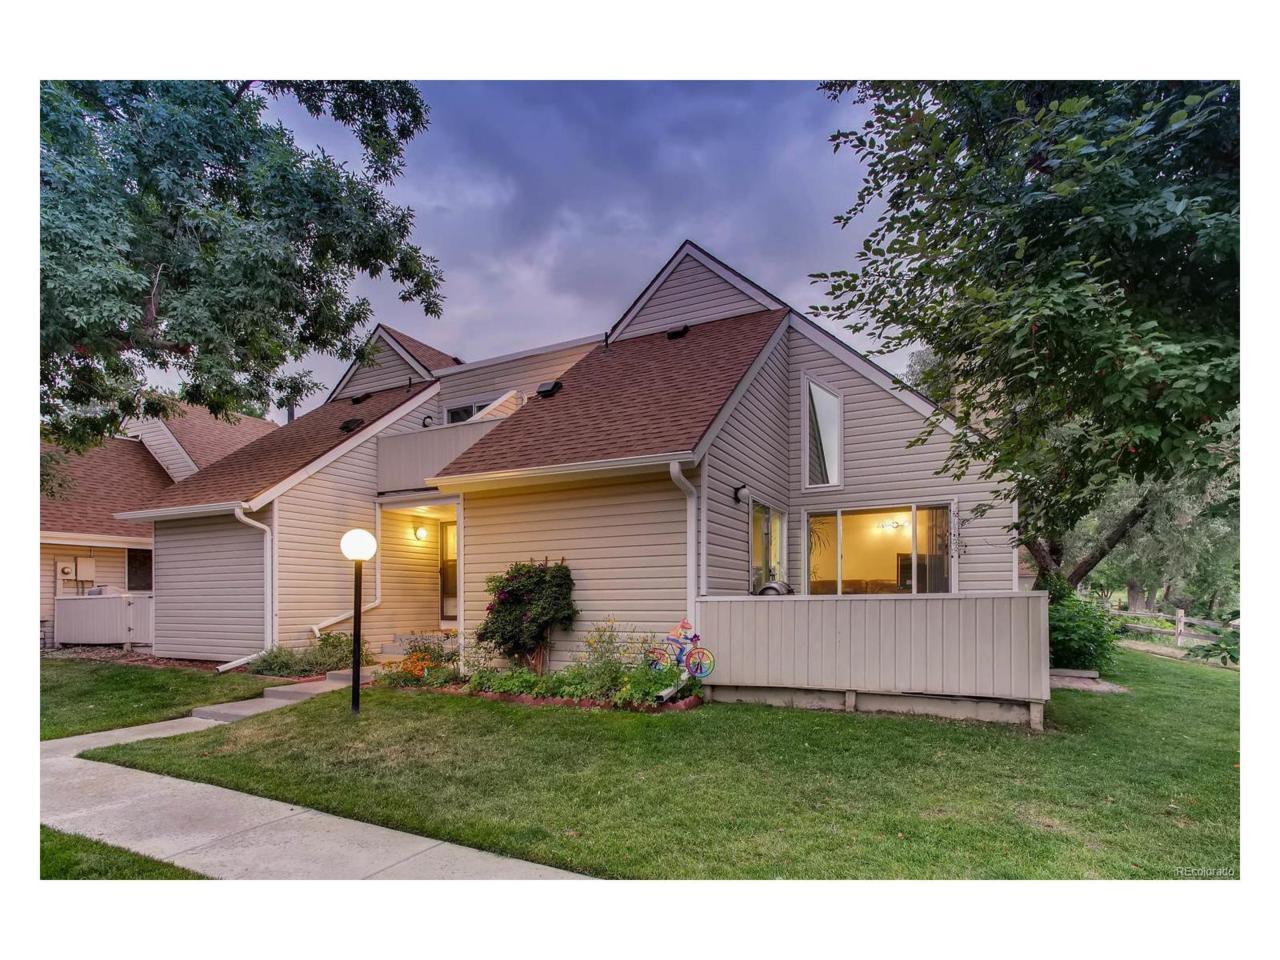 2423 S Xanadu Way A, Aurora, CO 80014 (MLS #3027625) :: 8z Real Estate